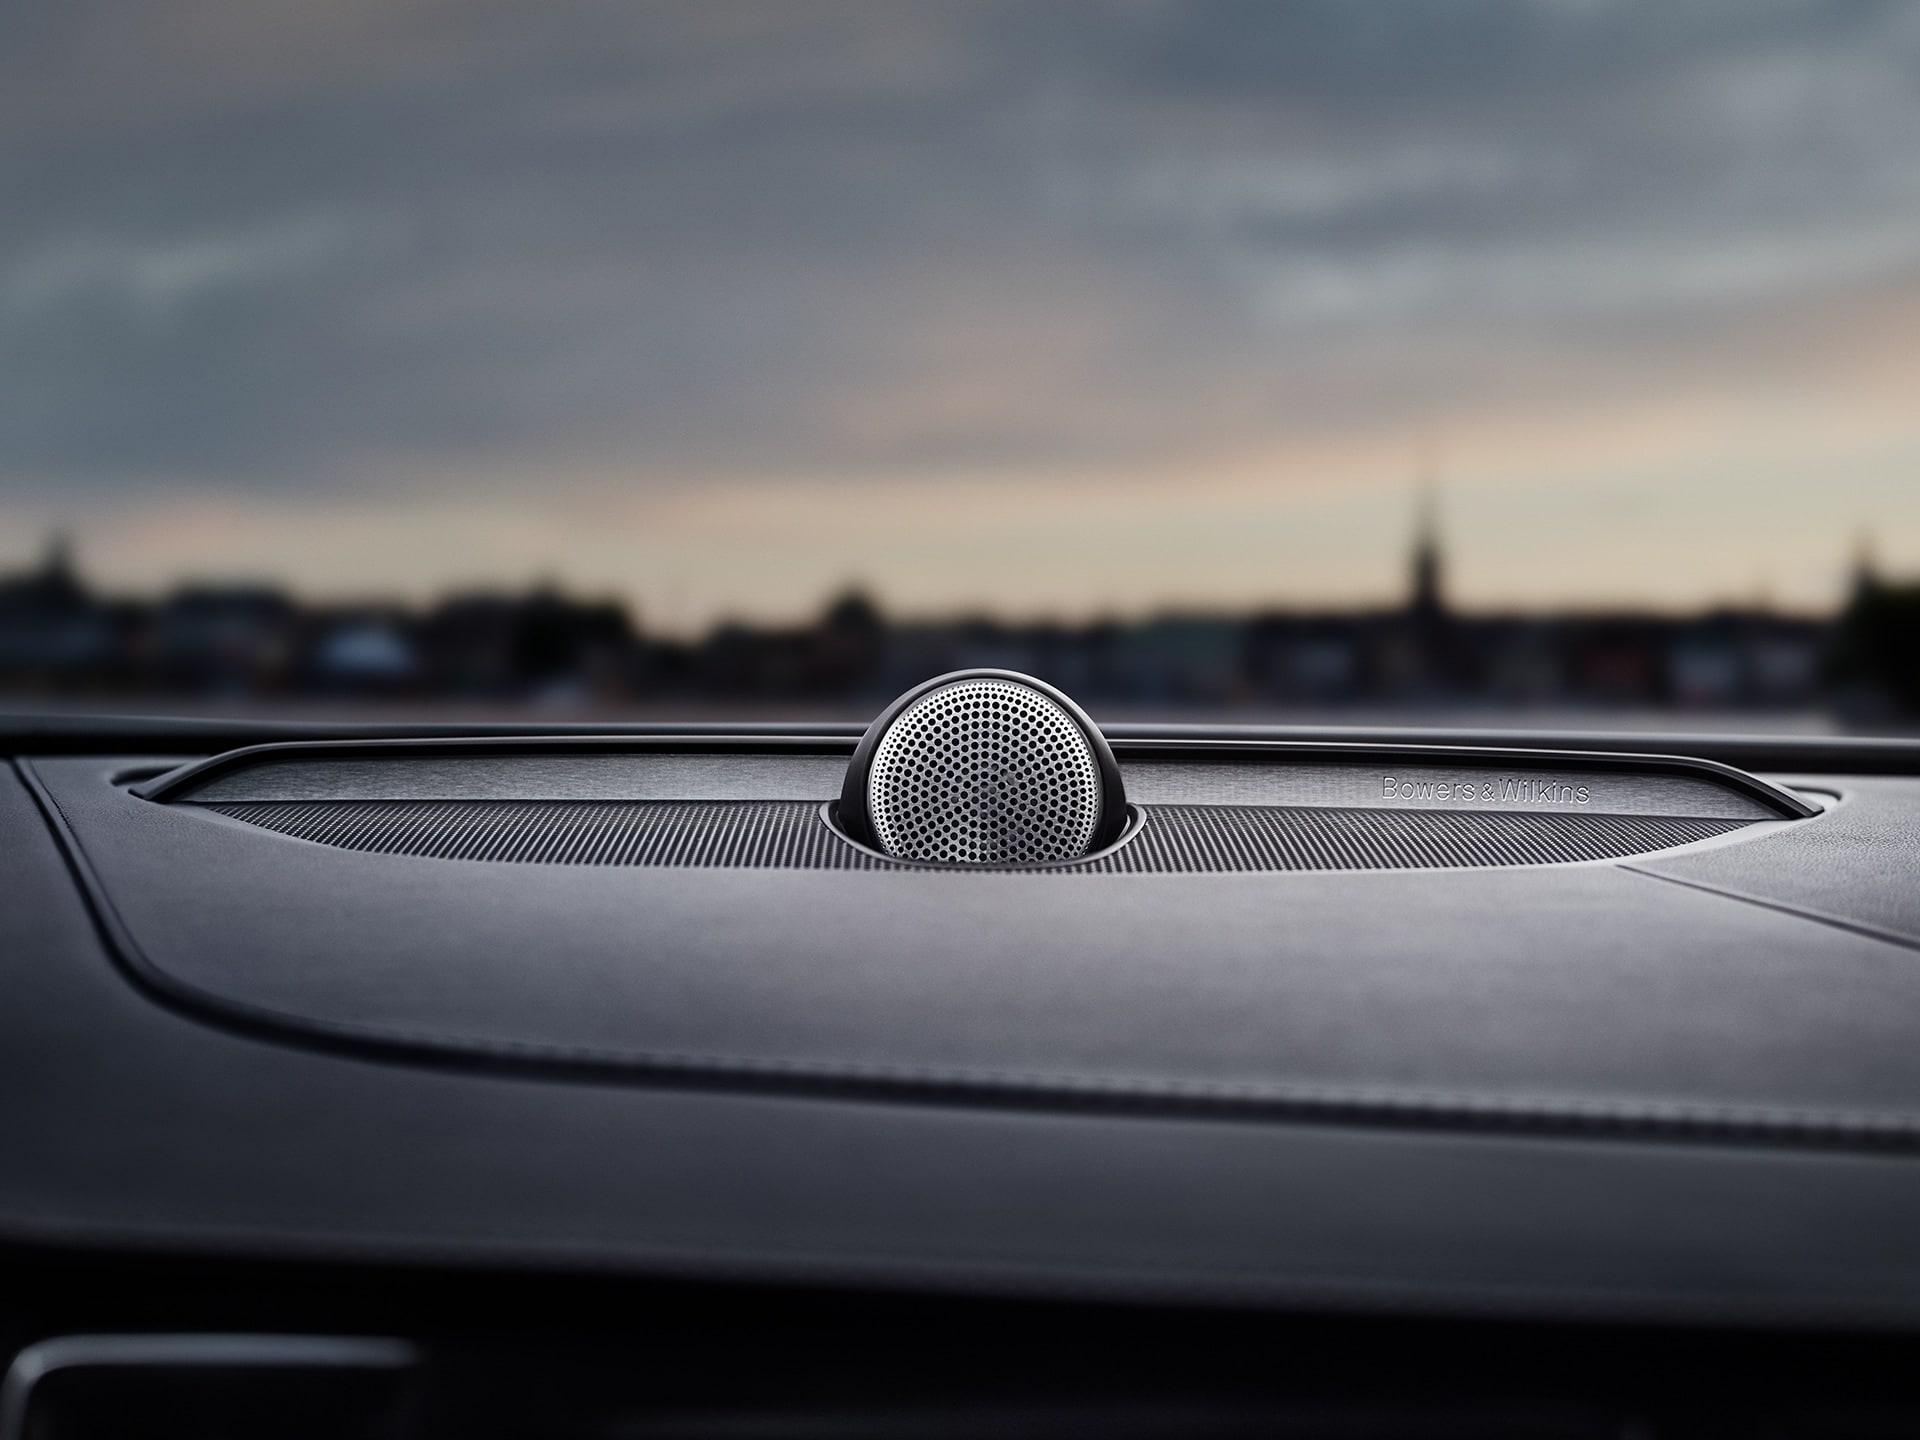 Bowers & Wilkins-luidsprekers in een Volvo XC90.